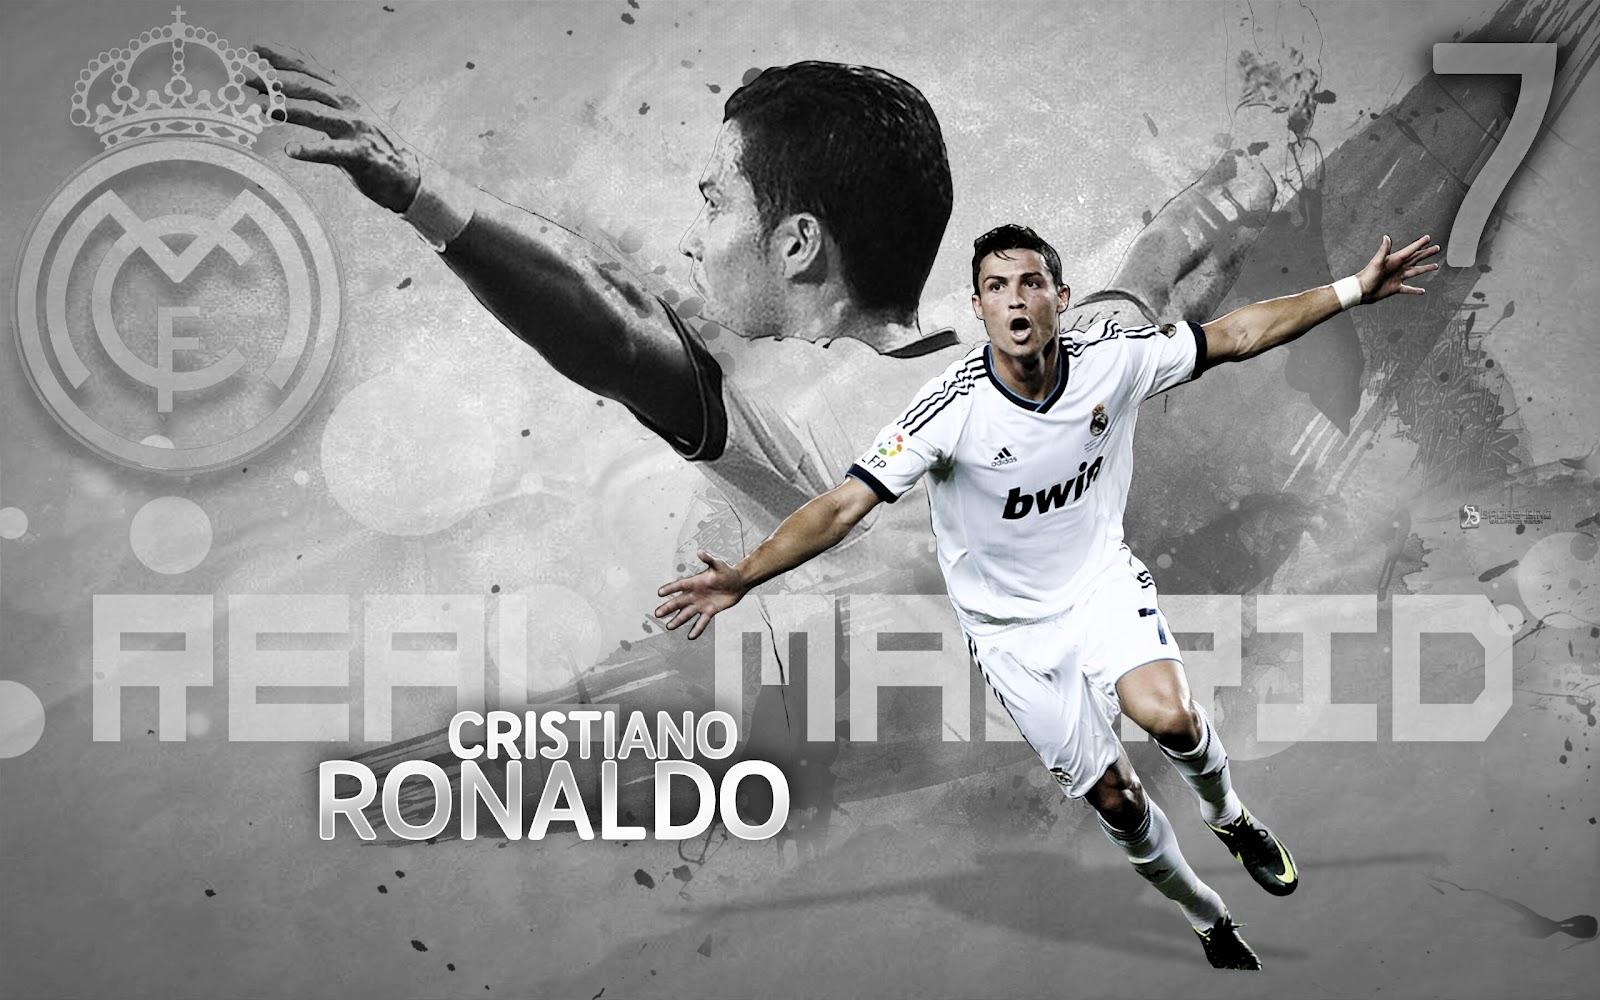 http://1.bp.blogspot.com/-bxXg-z2Wg2w/UMTfD8-EqeI/AAAAAAAANZM/ub-AP3MestQ/s1600/Real+Madrid+2013+Wallpaper+HD+Cristiano+Ronaldo.jpg